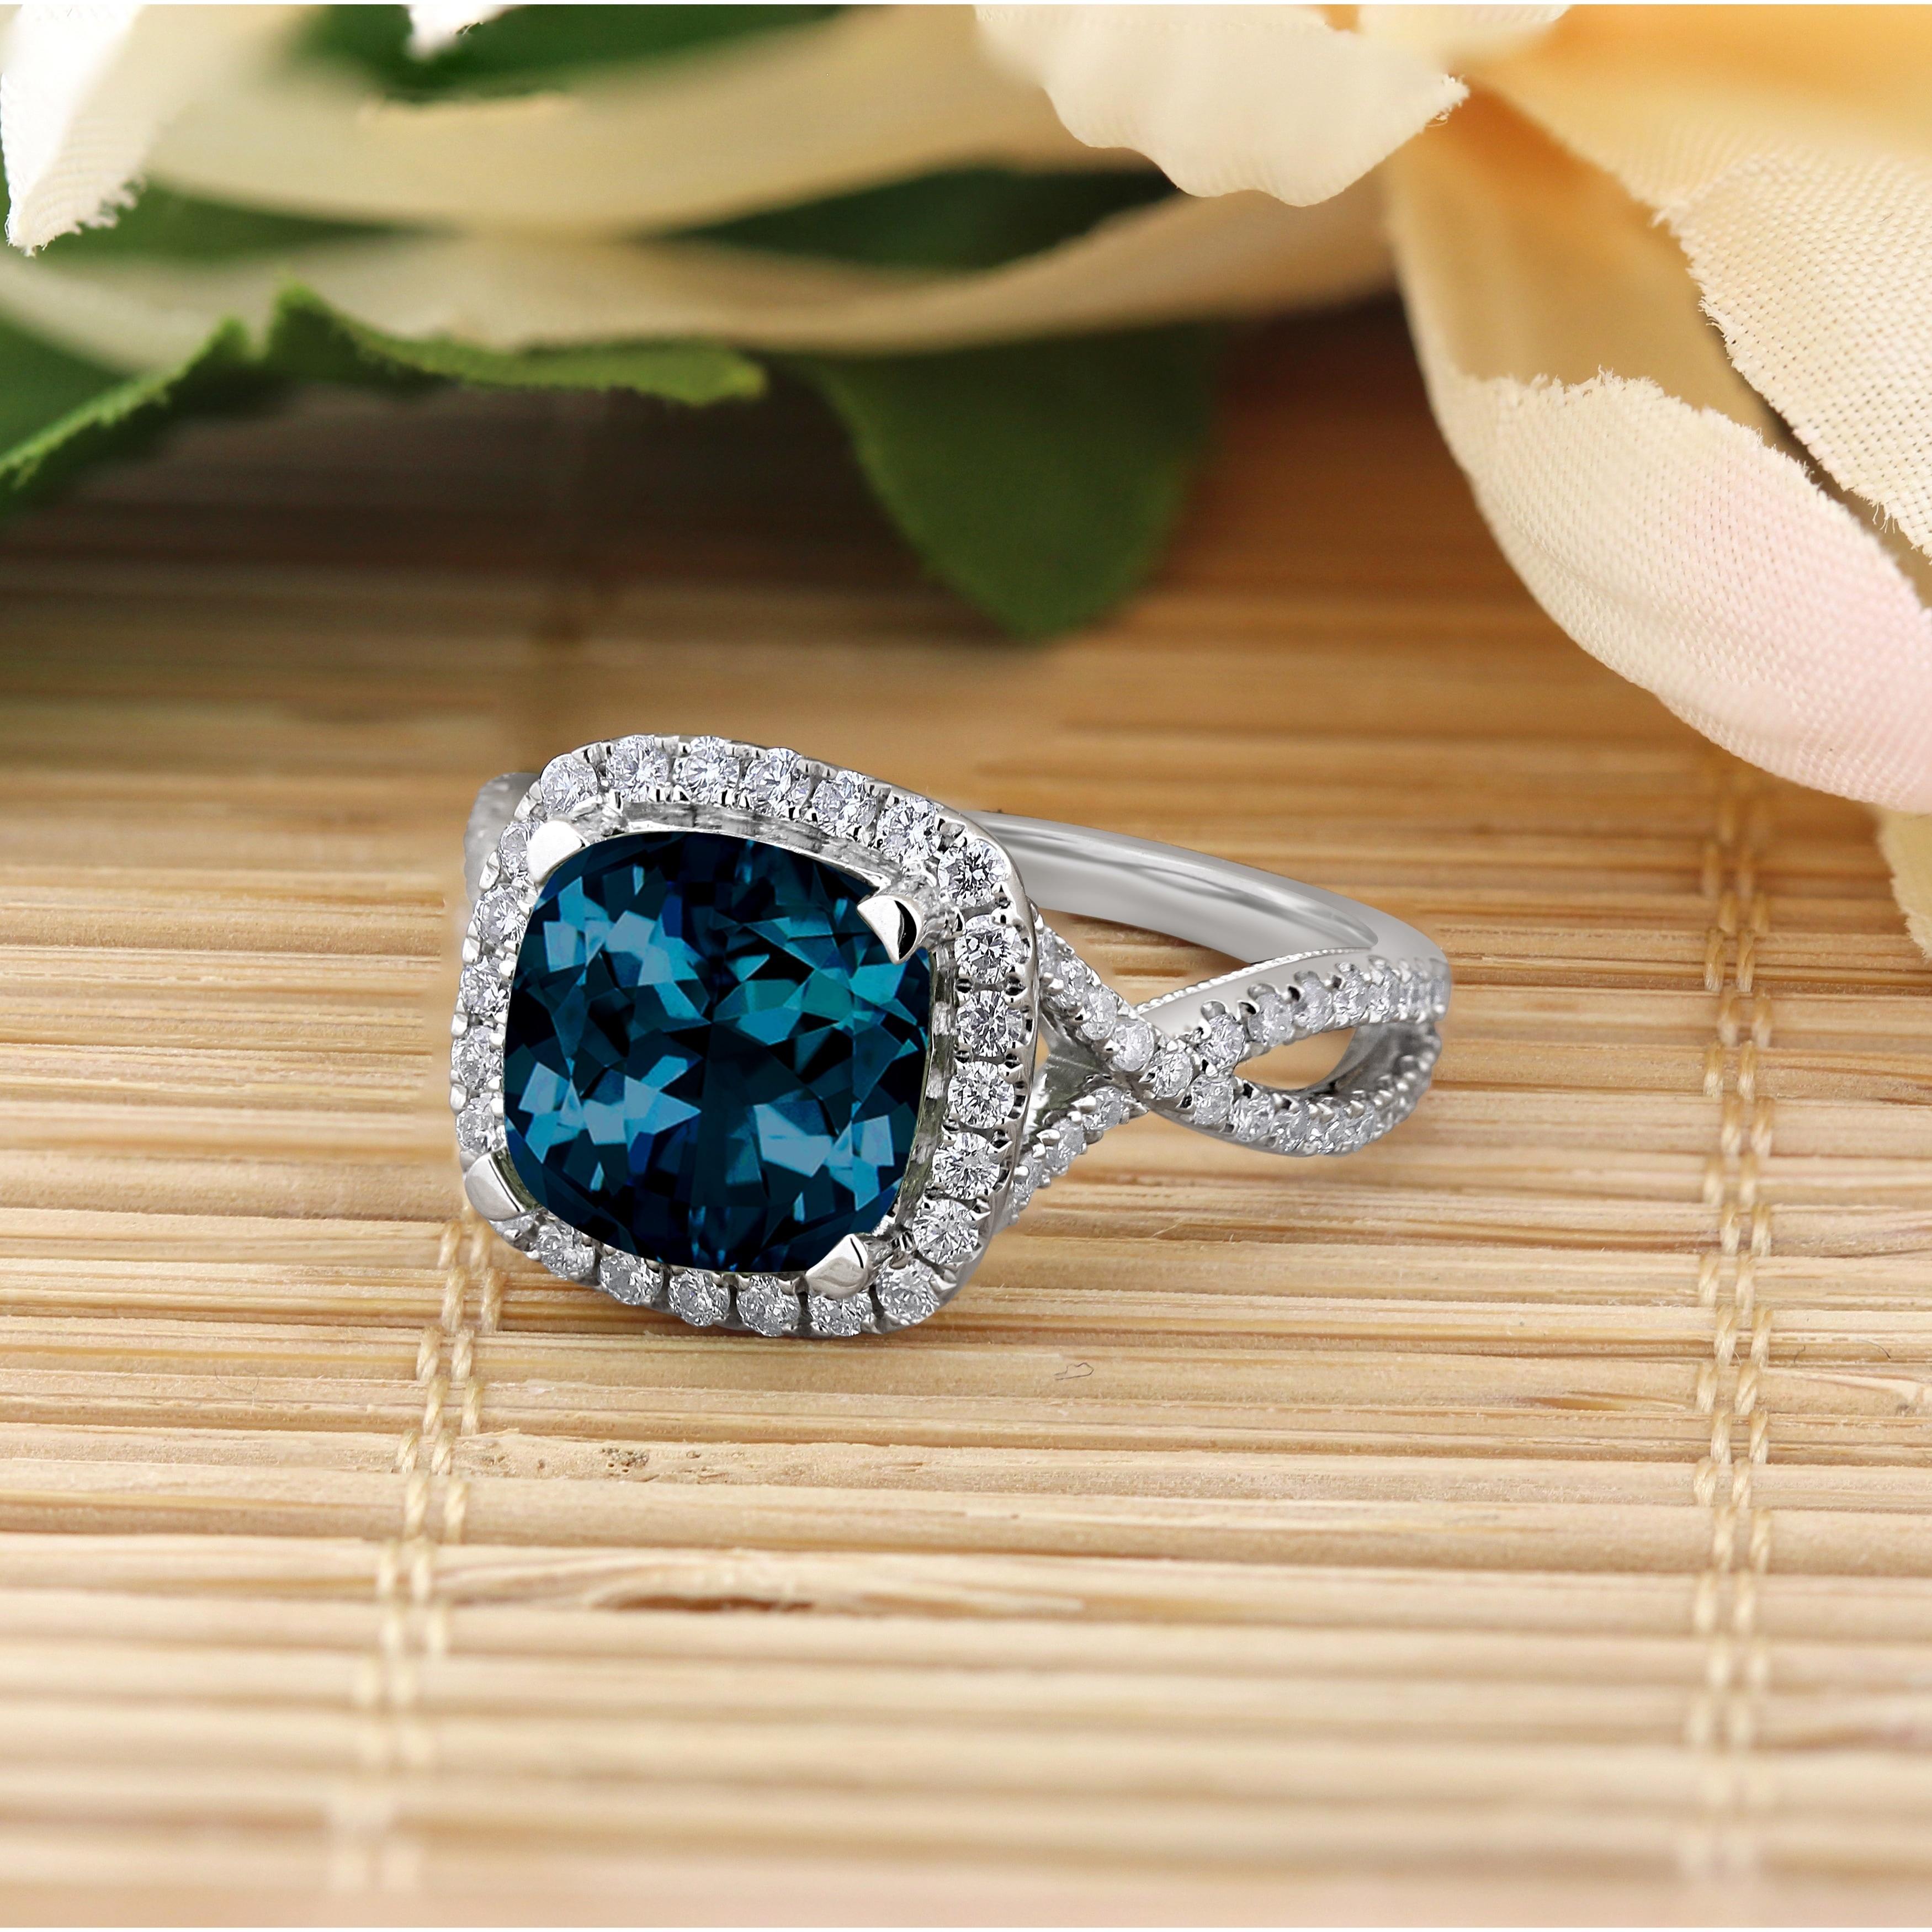 Auriya 3 1 8ct Fancy Cushion Cut London Blue Topaz And 1 2ctw Halo Diamond Engagement Ring 14k Gold